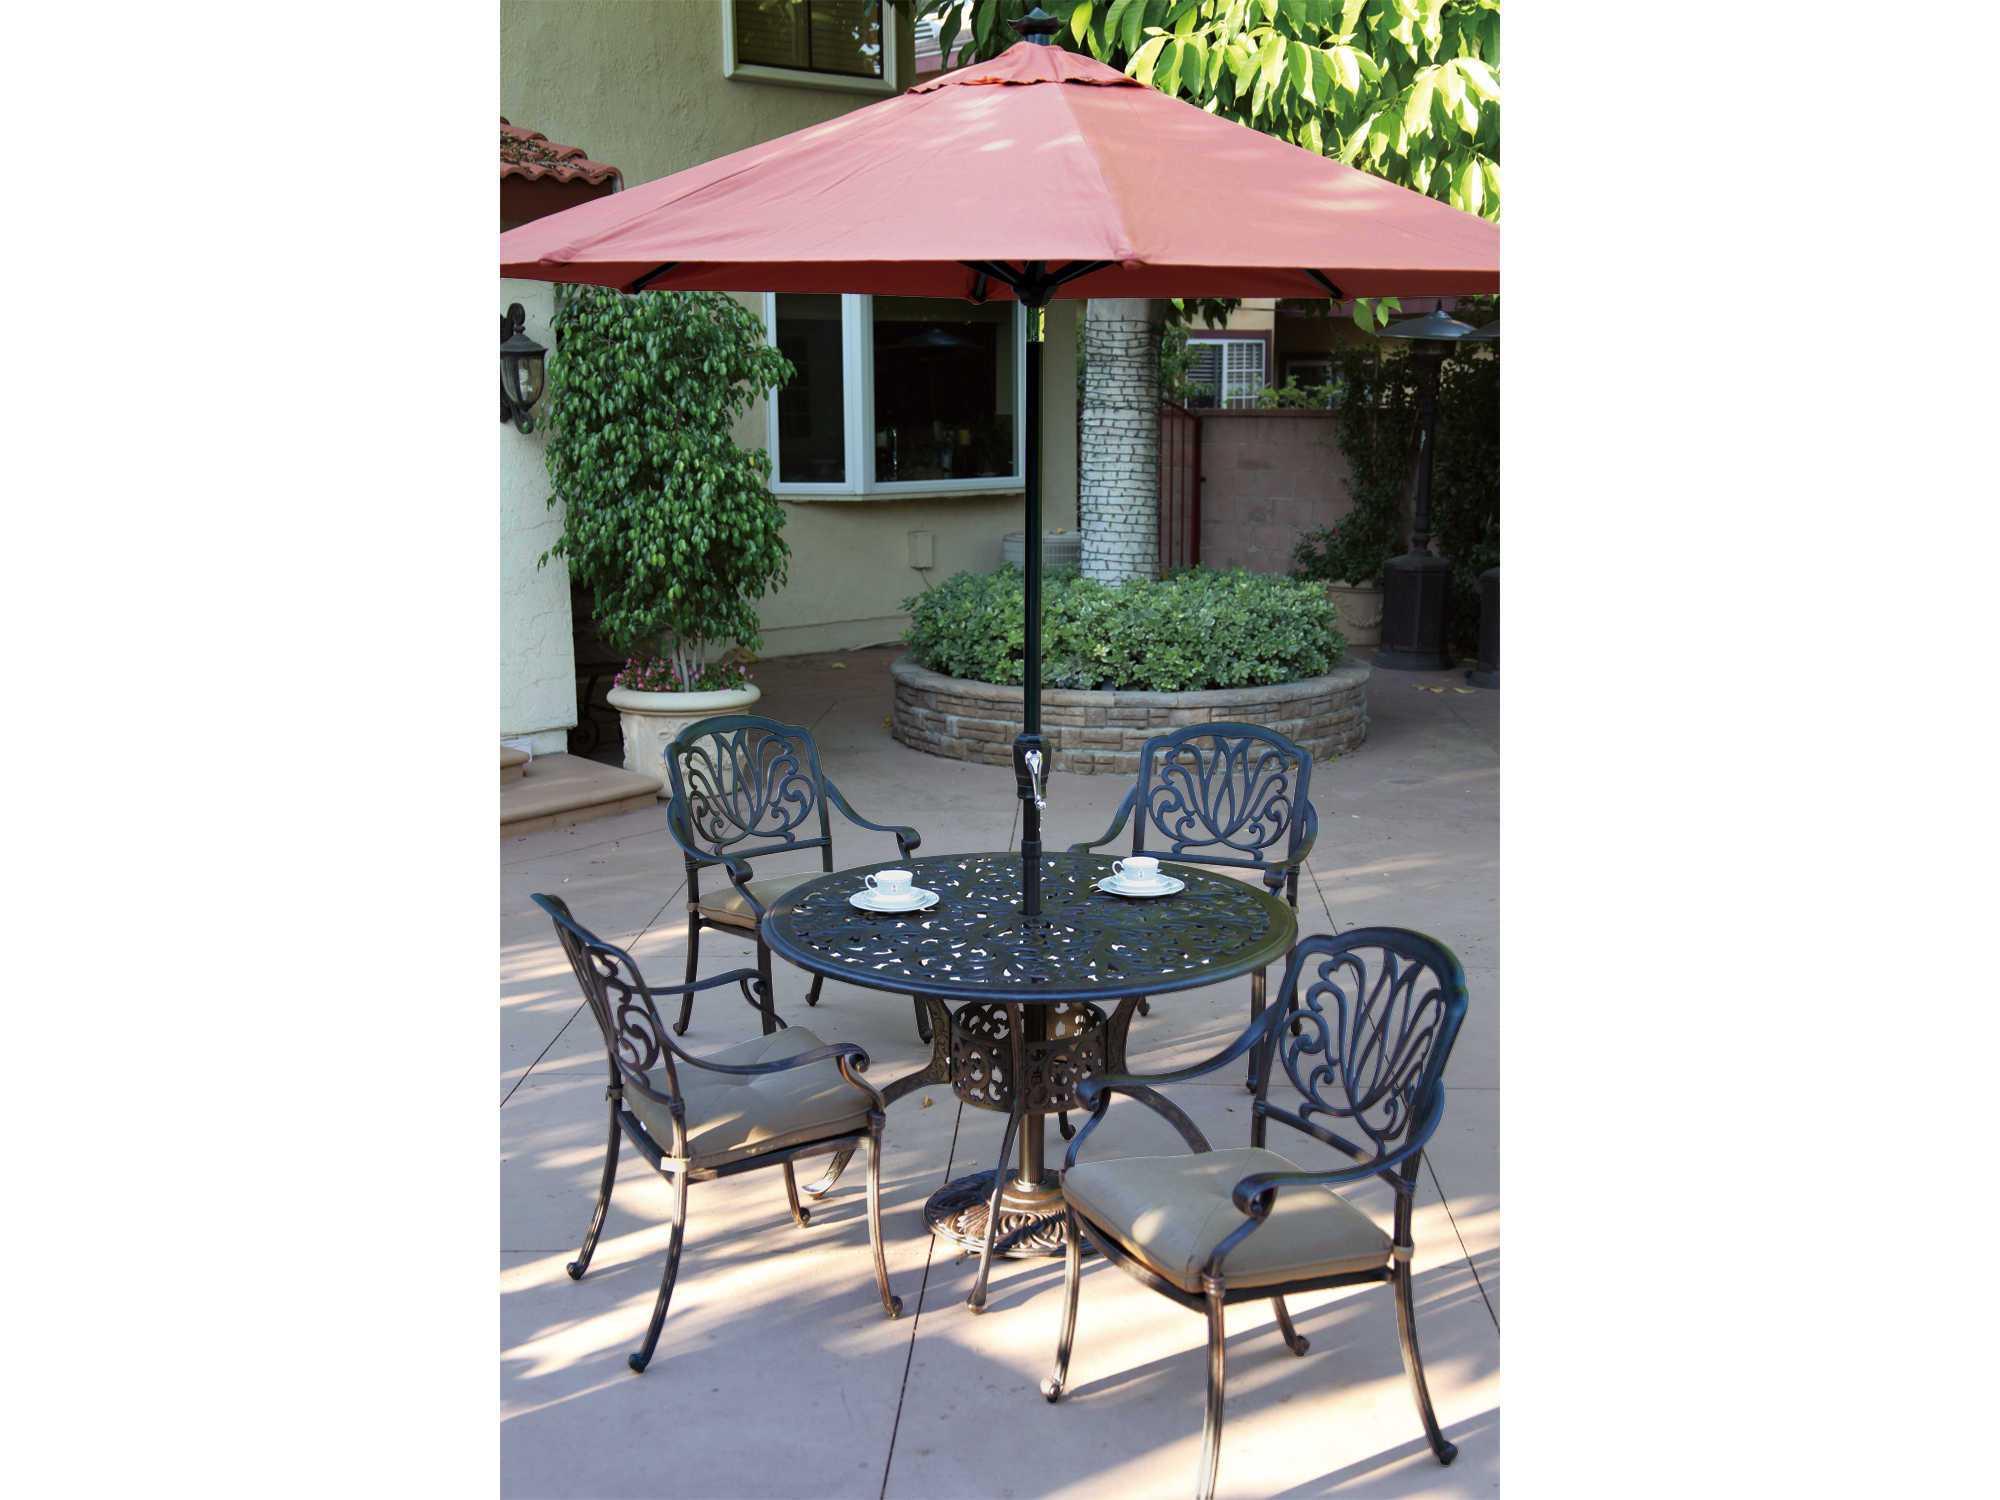 Superb Darlee Outdoor Living Series 80 Cast Aluminum Antique Bronze 48 Round Dining Table Home Interior And Landscaping Spoatsignezvosmurscom